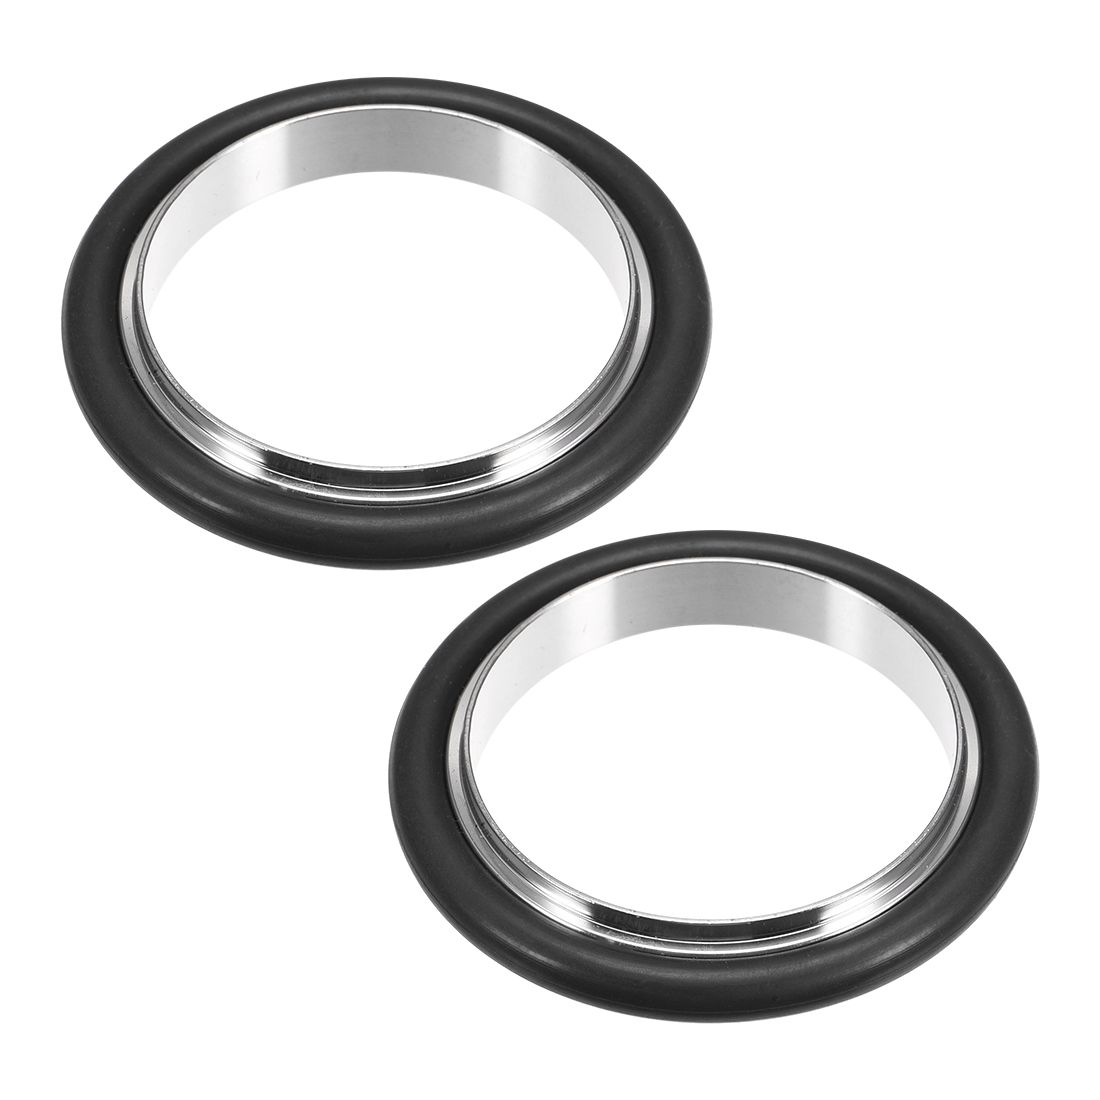 2Pcs Centering Ring KF-40 Vacuum Fittings ISO-KF Flange 53mm x 39mm Fluororubber